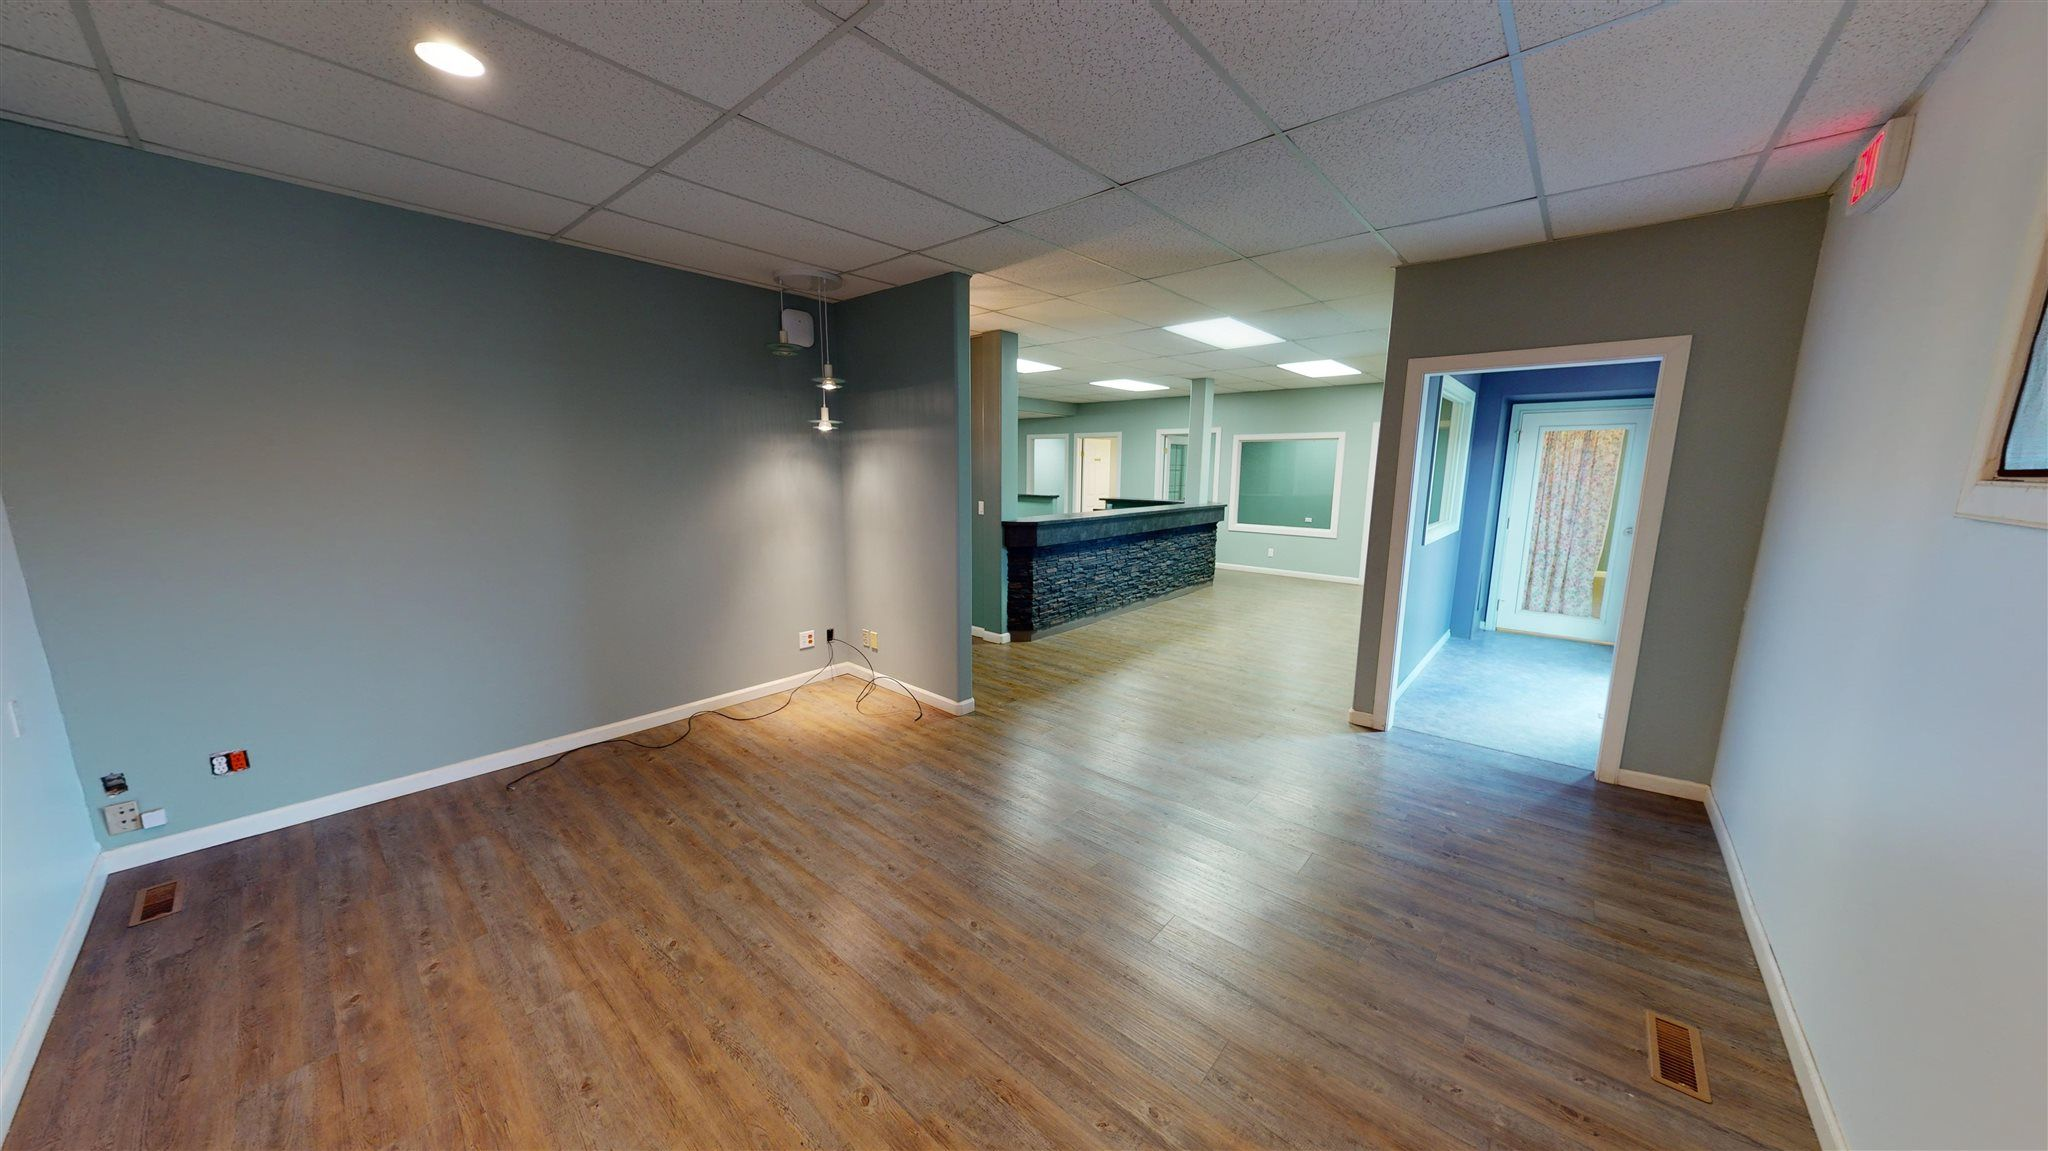 Photo 6: Photos: 10067 100 Avenue in Fort St. John: Fort St. John - City NW Office for sale (Fort St. John (Zone 60))  : MLS®# C8039097